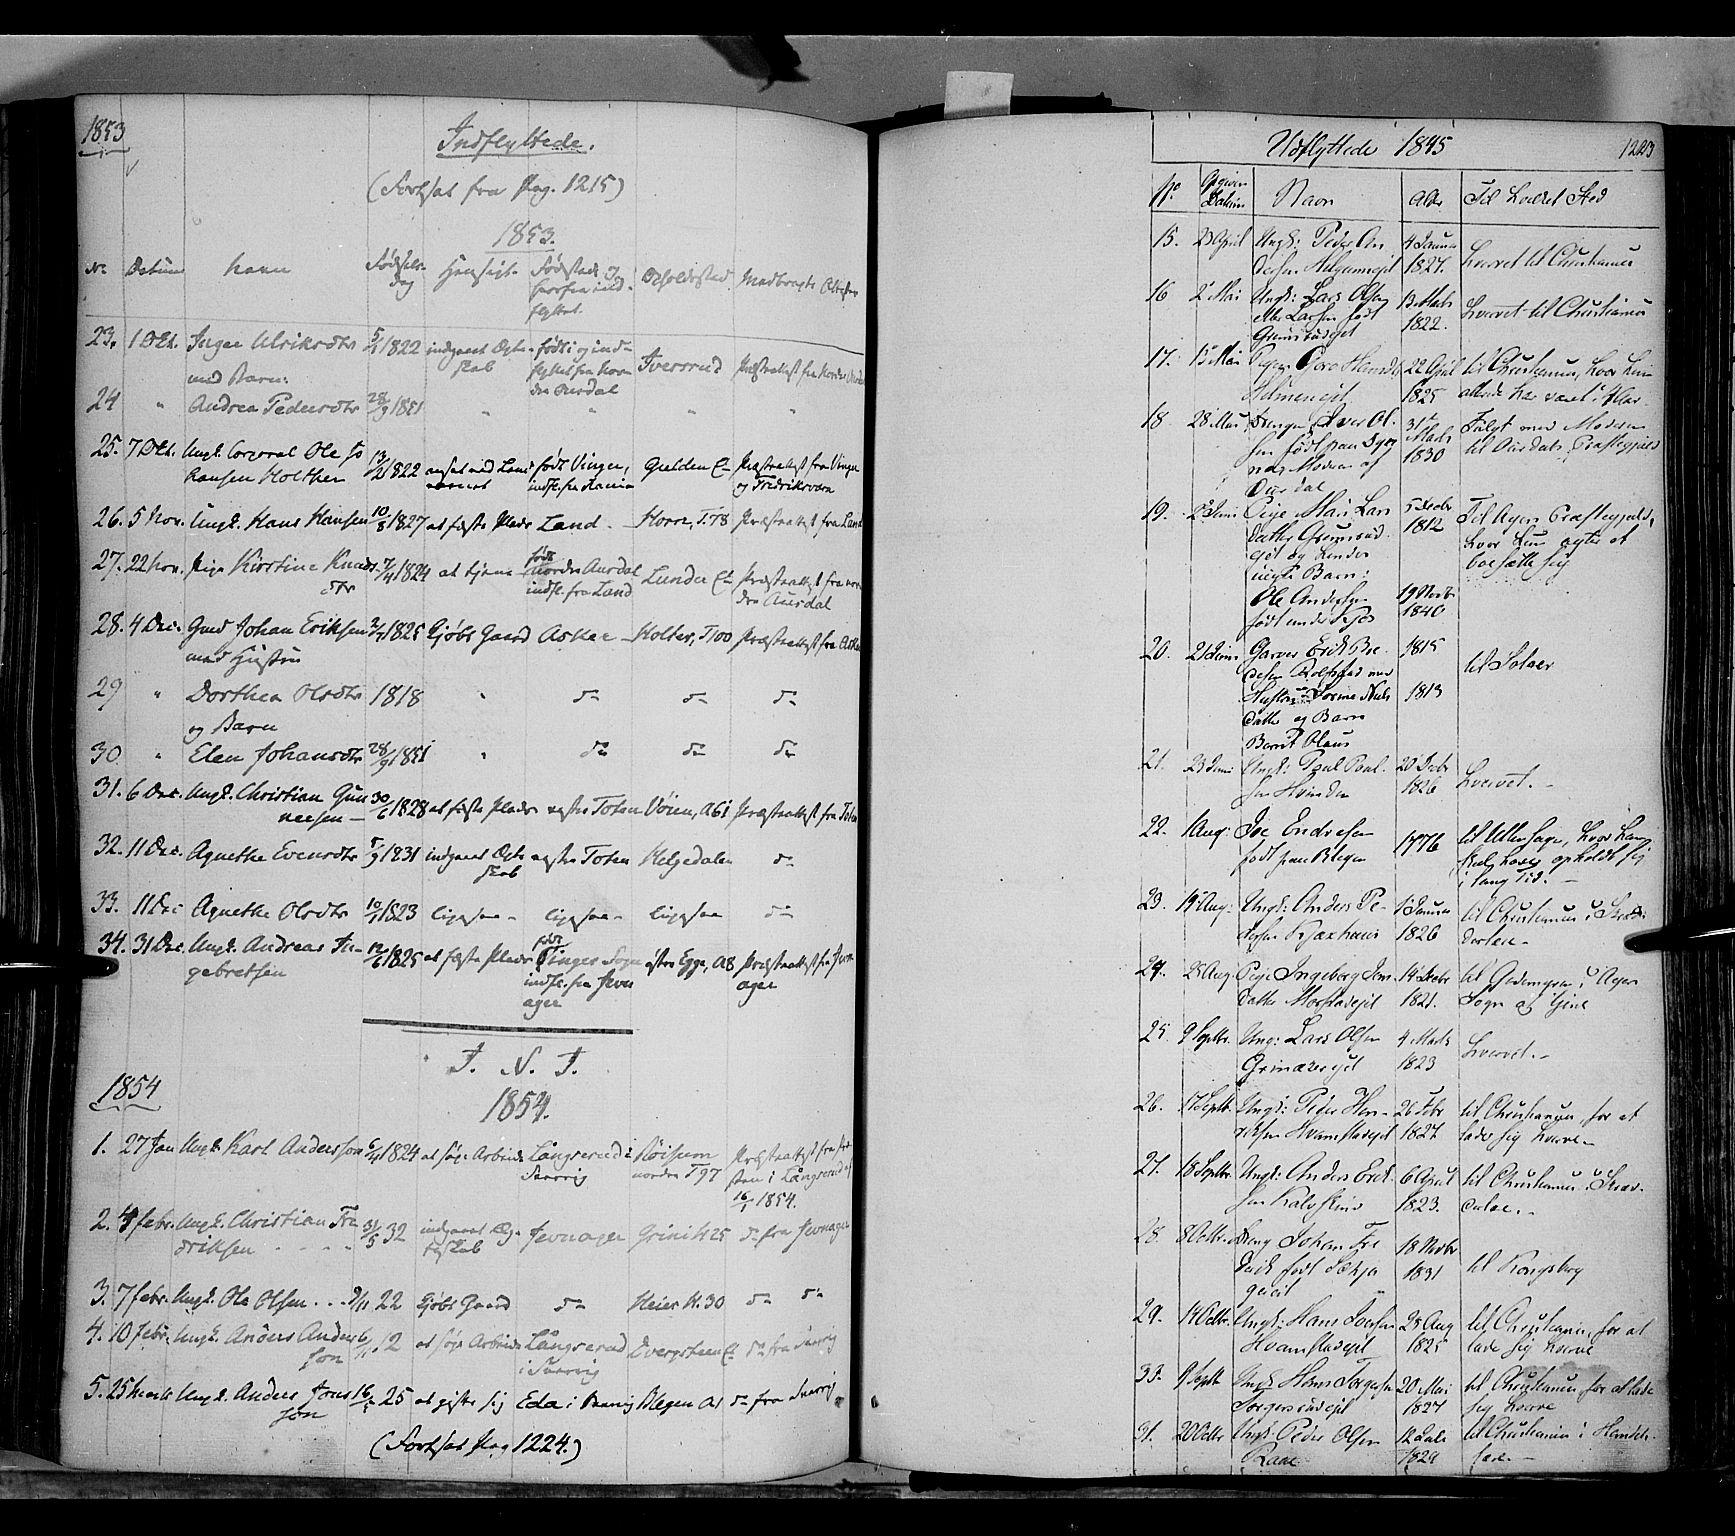 SAH, Gran prestekontor, Ministerialbok nr. 11, 1842-1856, s. 1222-1223